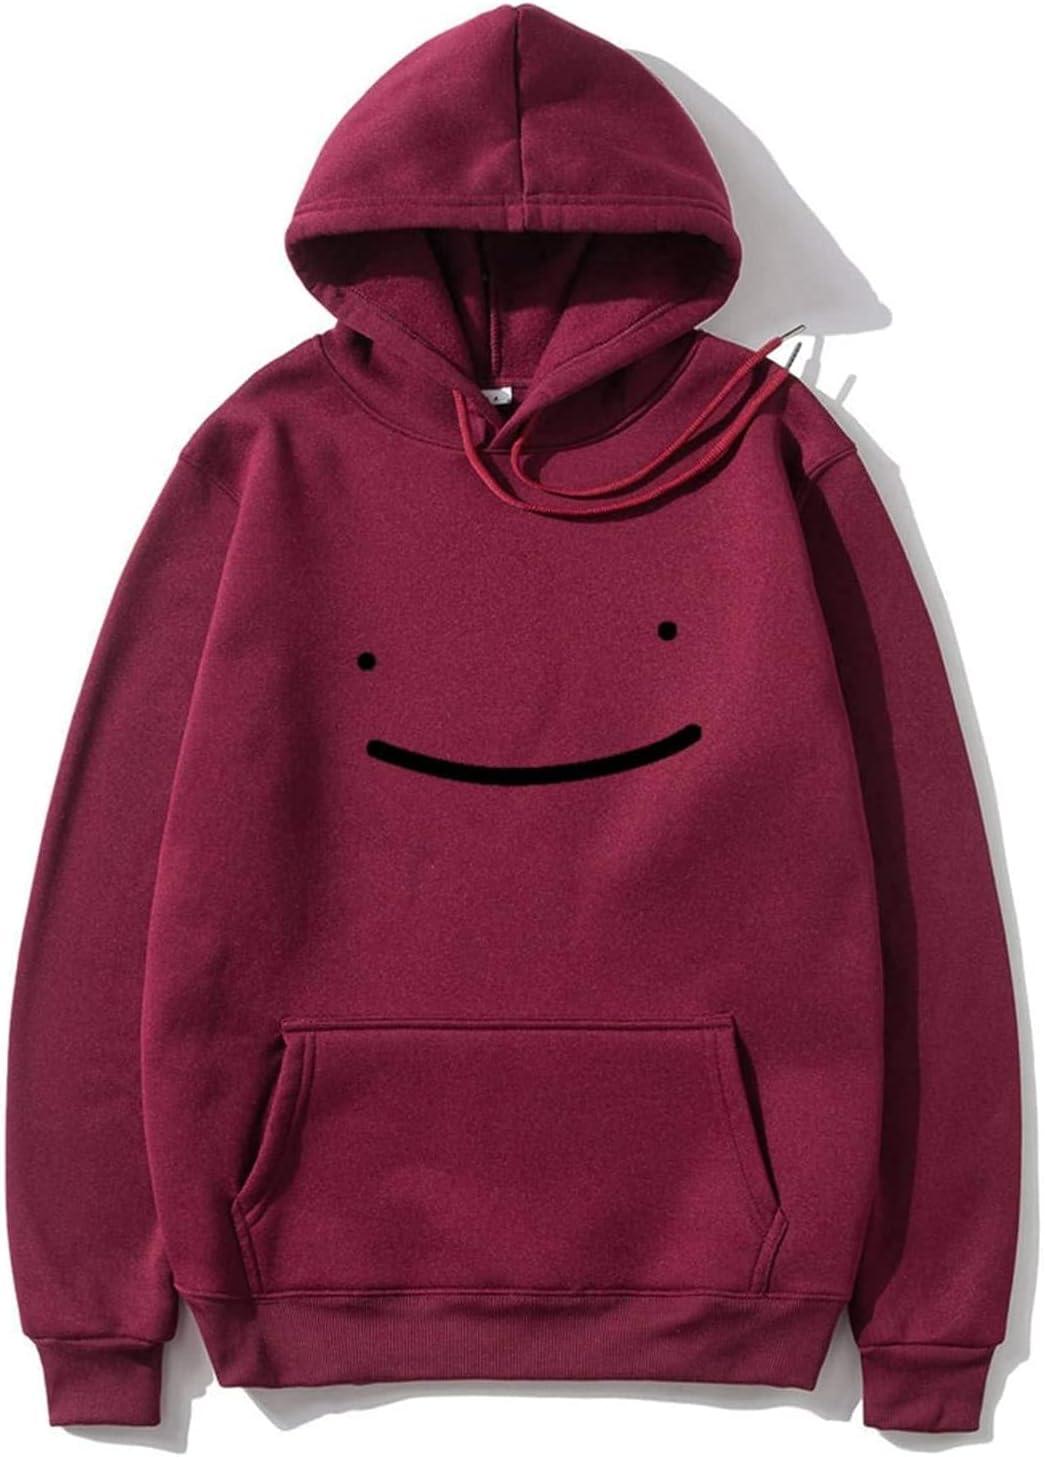 MAORR Cartoon Hooded Sweater, Moletom Com Capuz Moletom Masculino Feminino Harajuku Pullover Moletom Streetwear Moda Casual Roupas Grandes (Color : 21, Size : -M)